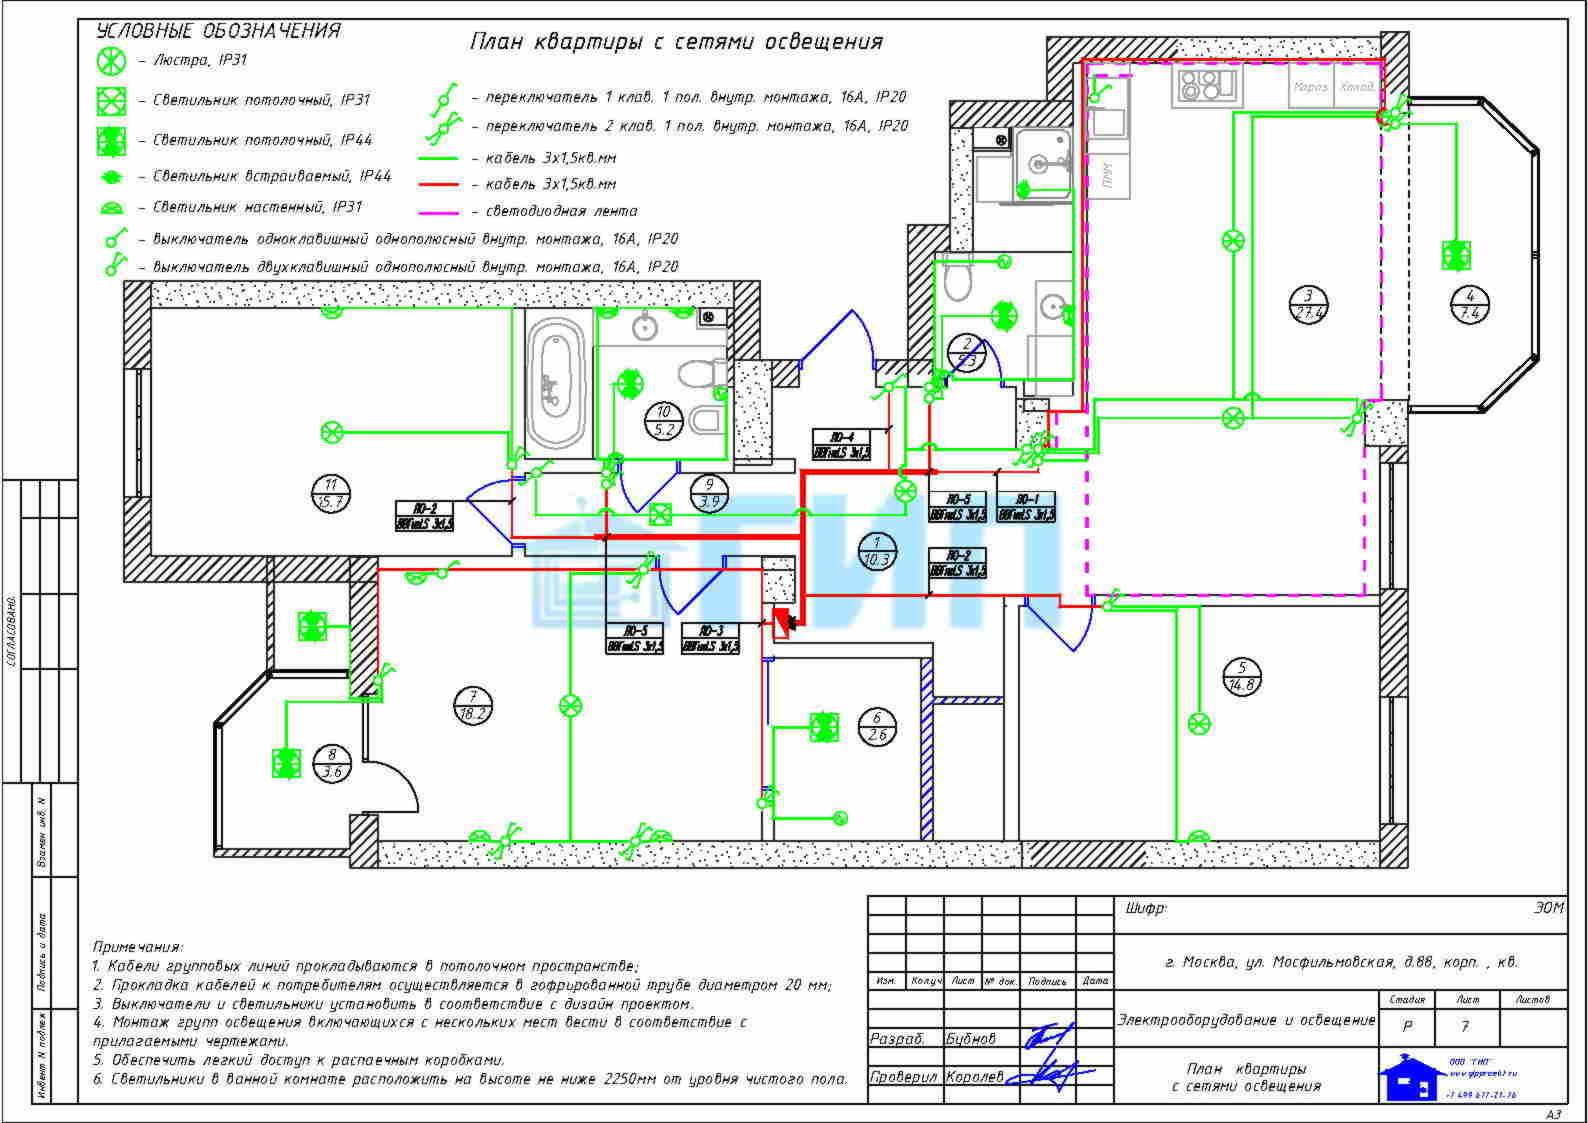 схема сетей вентиляции